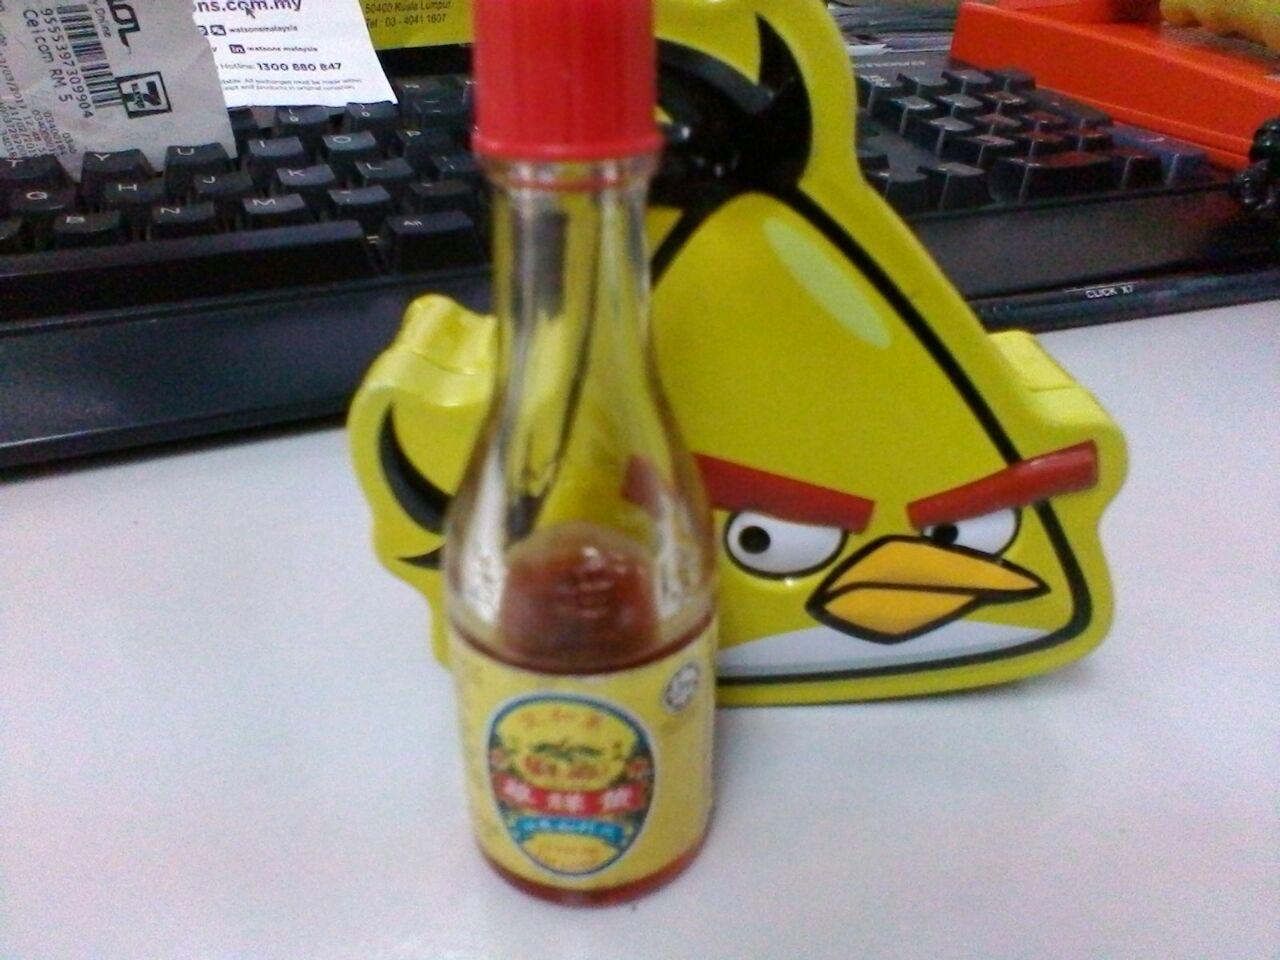 5 sebab minyak yu yee cap limau menjadi pilihan hati, kenapa perlu pilih minyak yu yee cap limau, kebaikan minyak yu yee cap limau